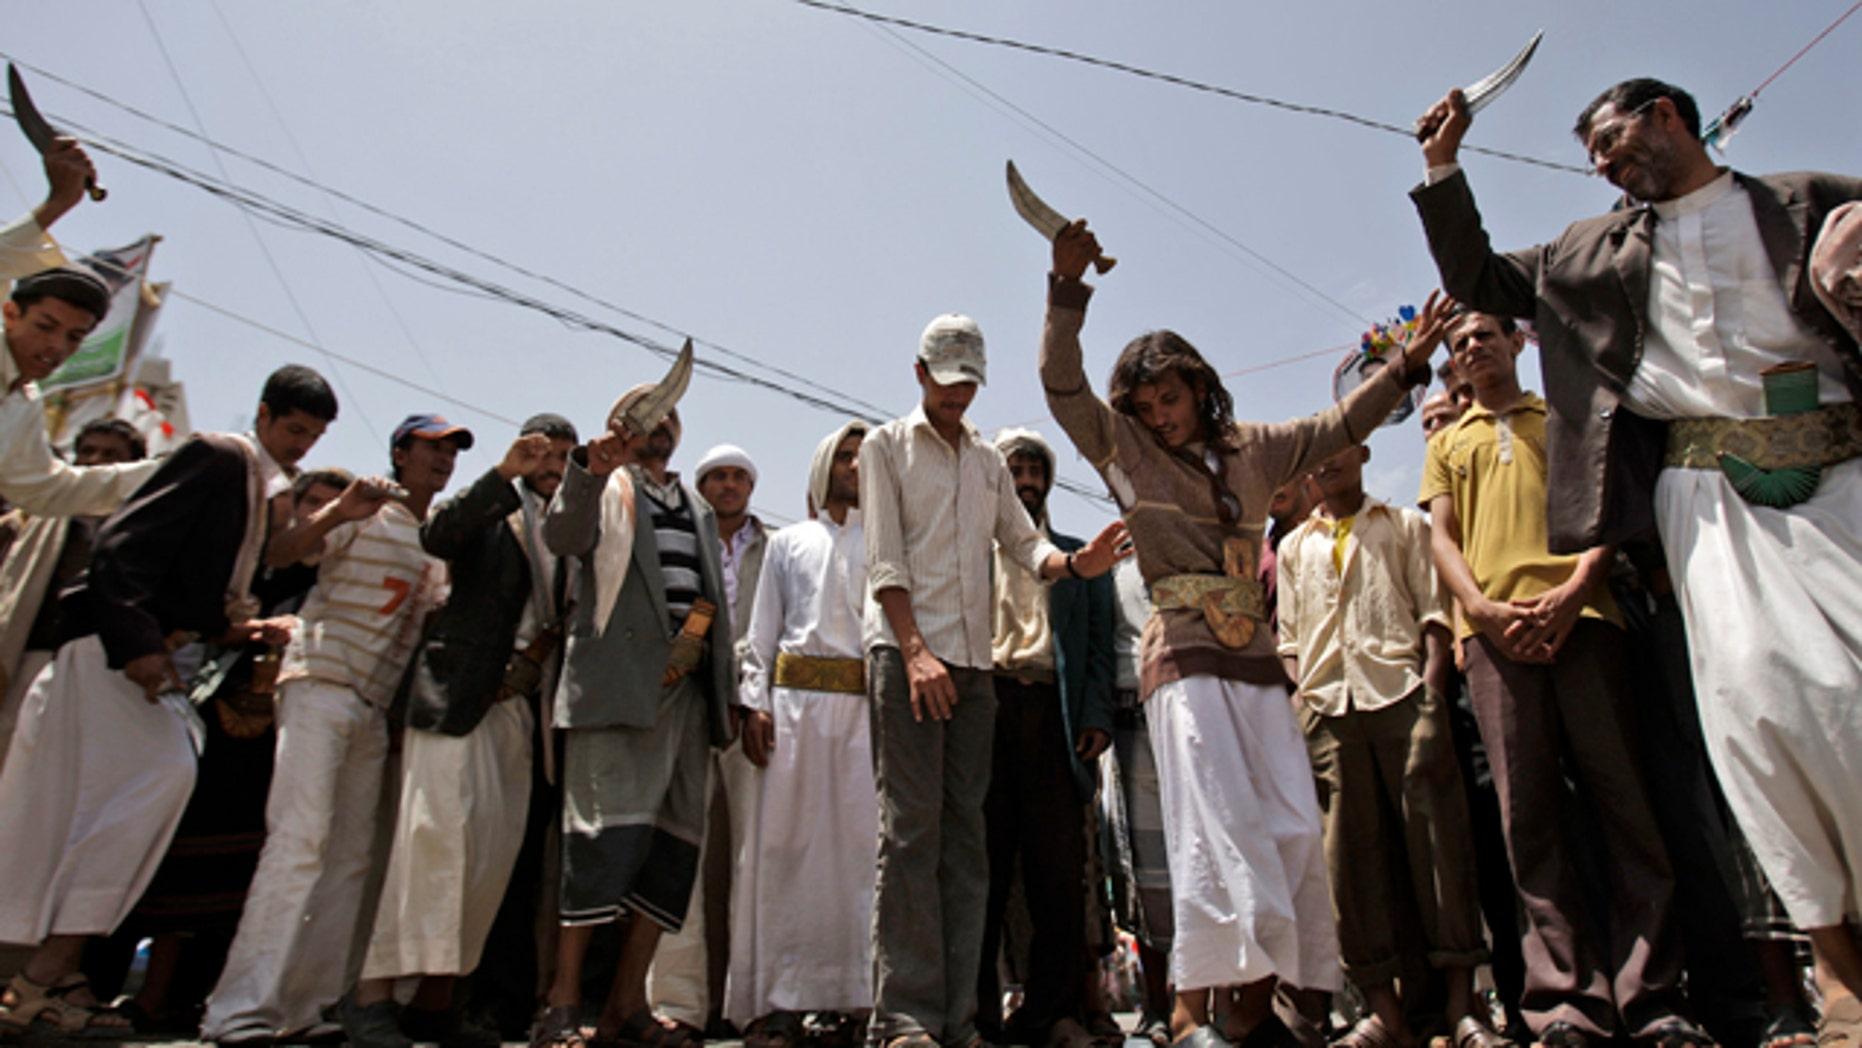 June 9: Anti-government protestors dance holding up daggers during a demonstration demanding the resignation of Yemeni President Ali Abdullah Saleh, in Sanaa, Yemen.